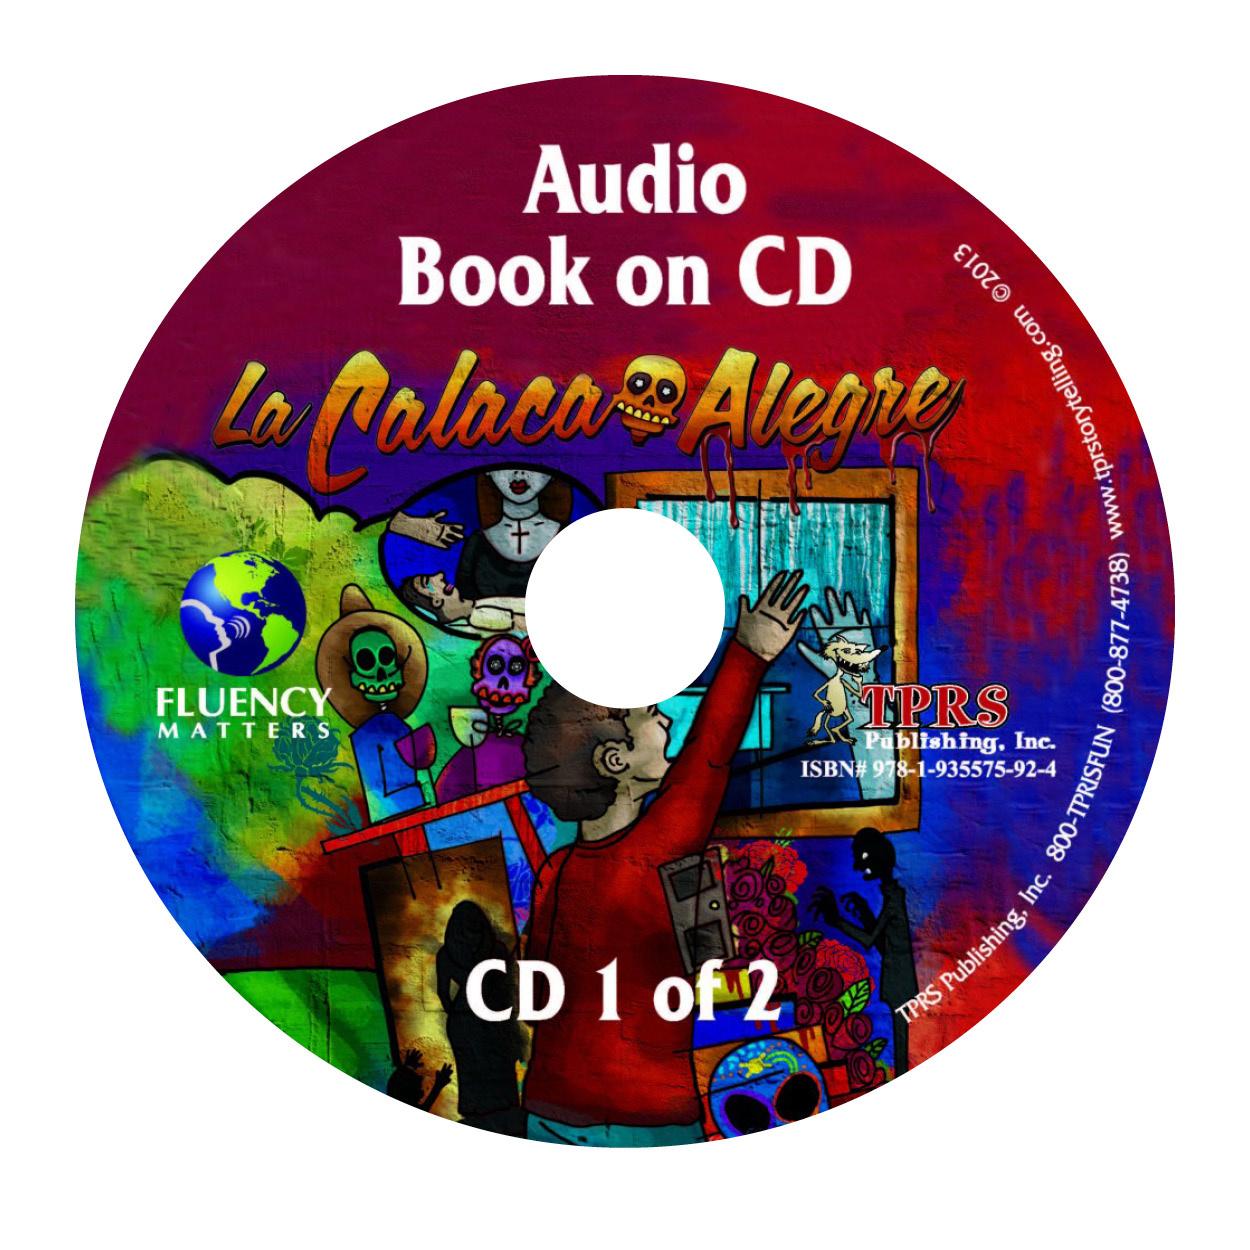 La calaca alegre - Audiobook